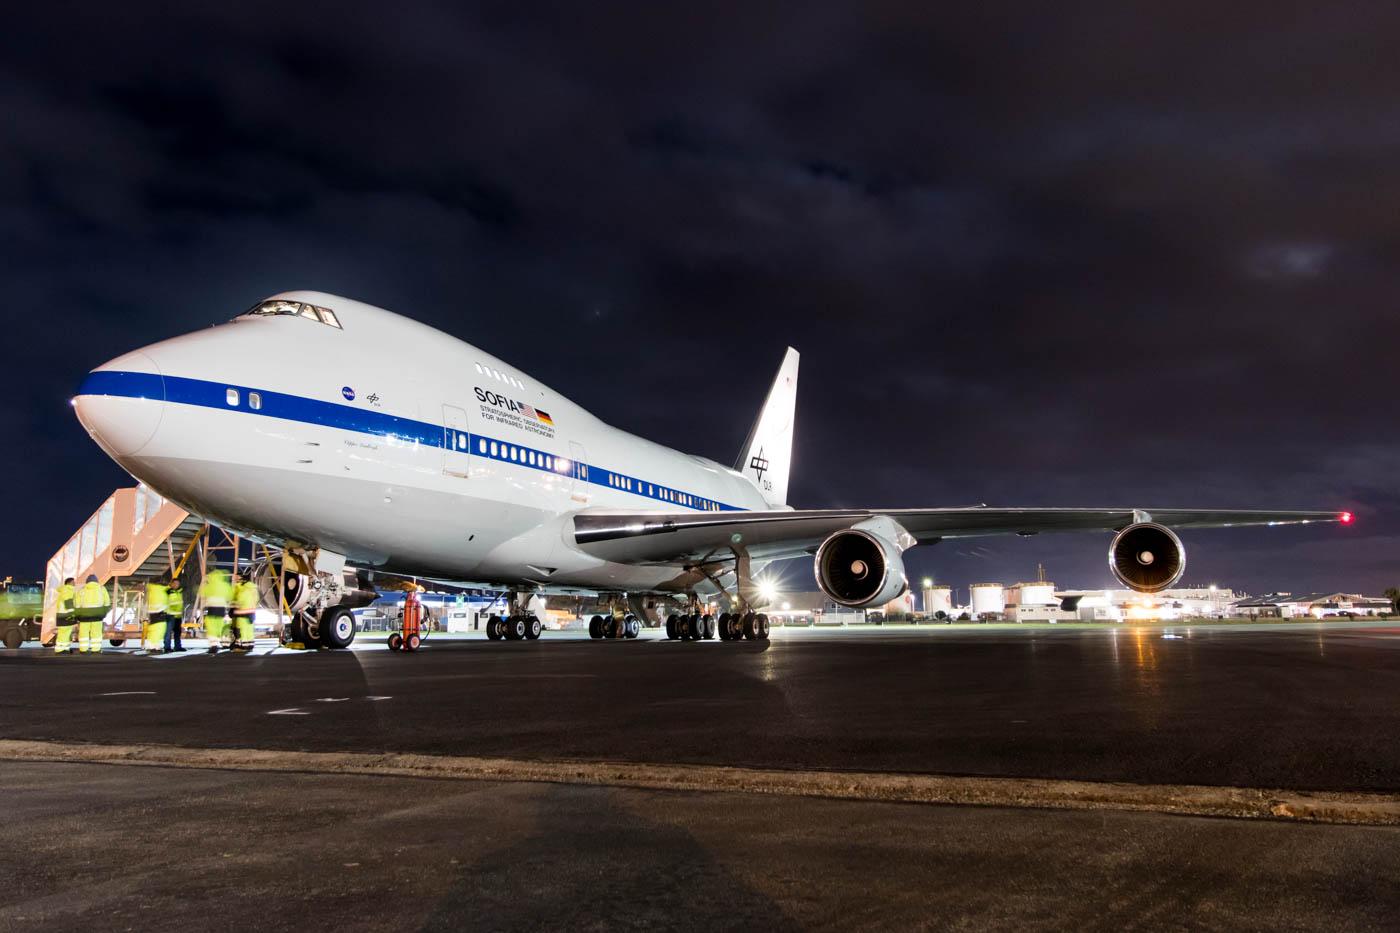 NASA SOFIA Boeing 747SP at Christchurch Airport